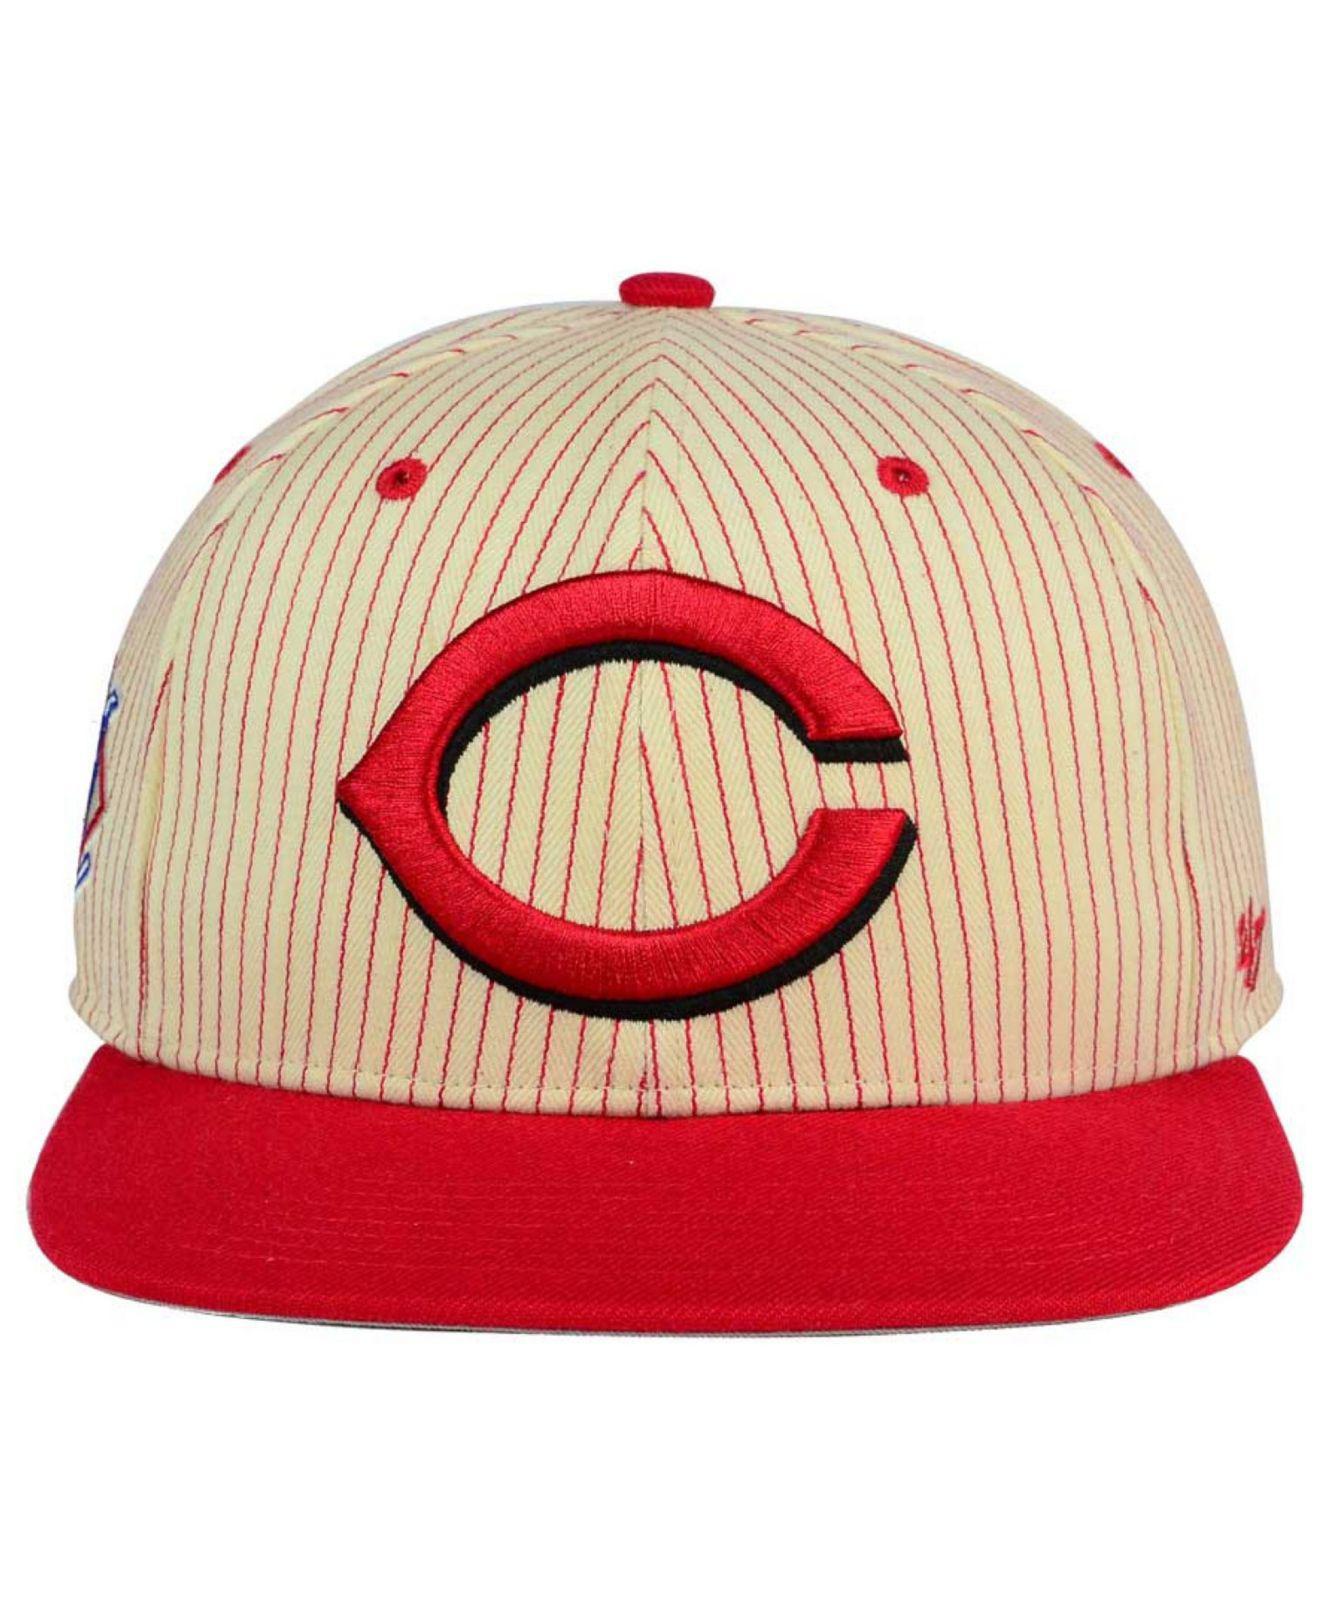 c360e91bde1 Lyst - 47 Brand Cincinnati Reds Woodside Captain Snapback Cap in Red ...